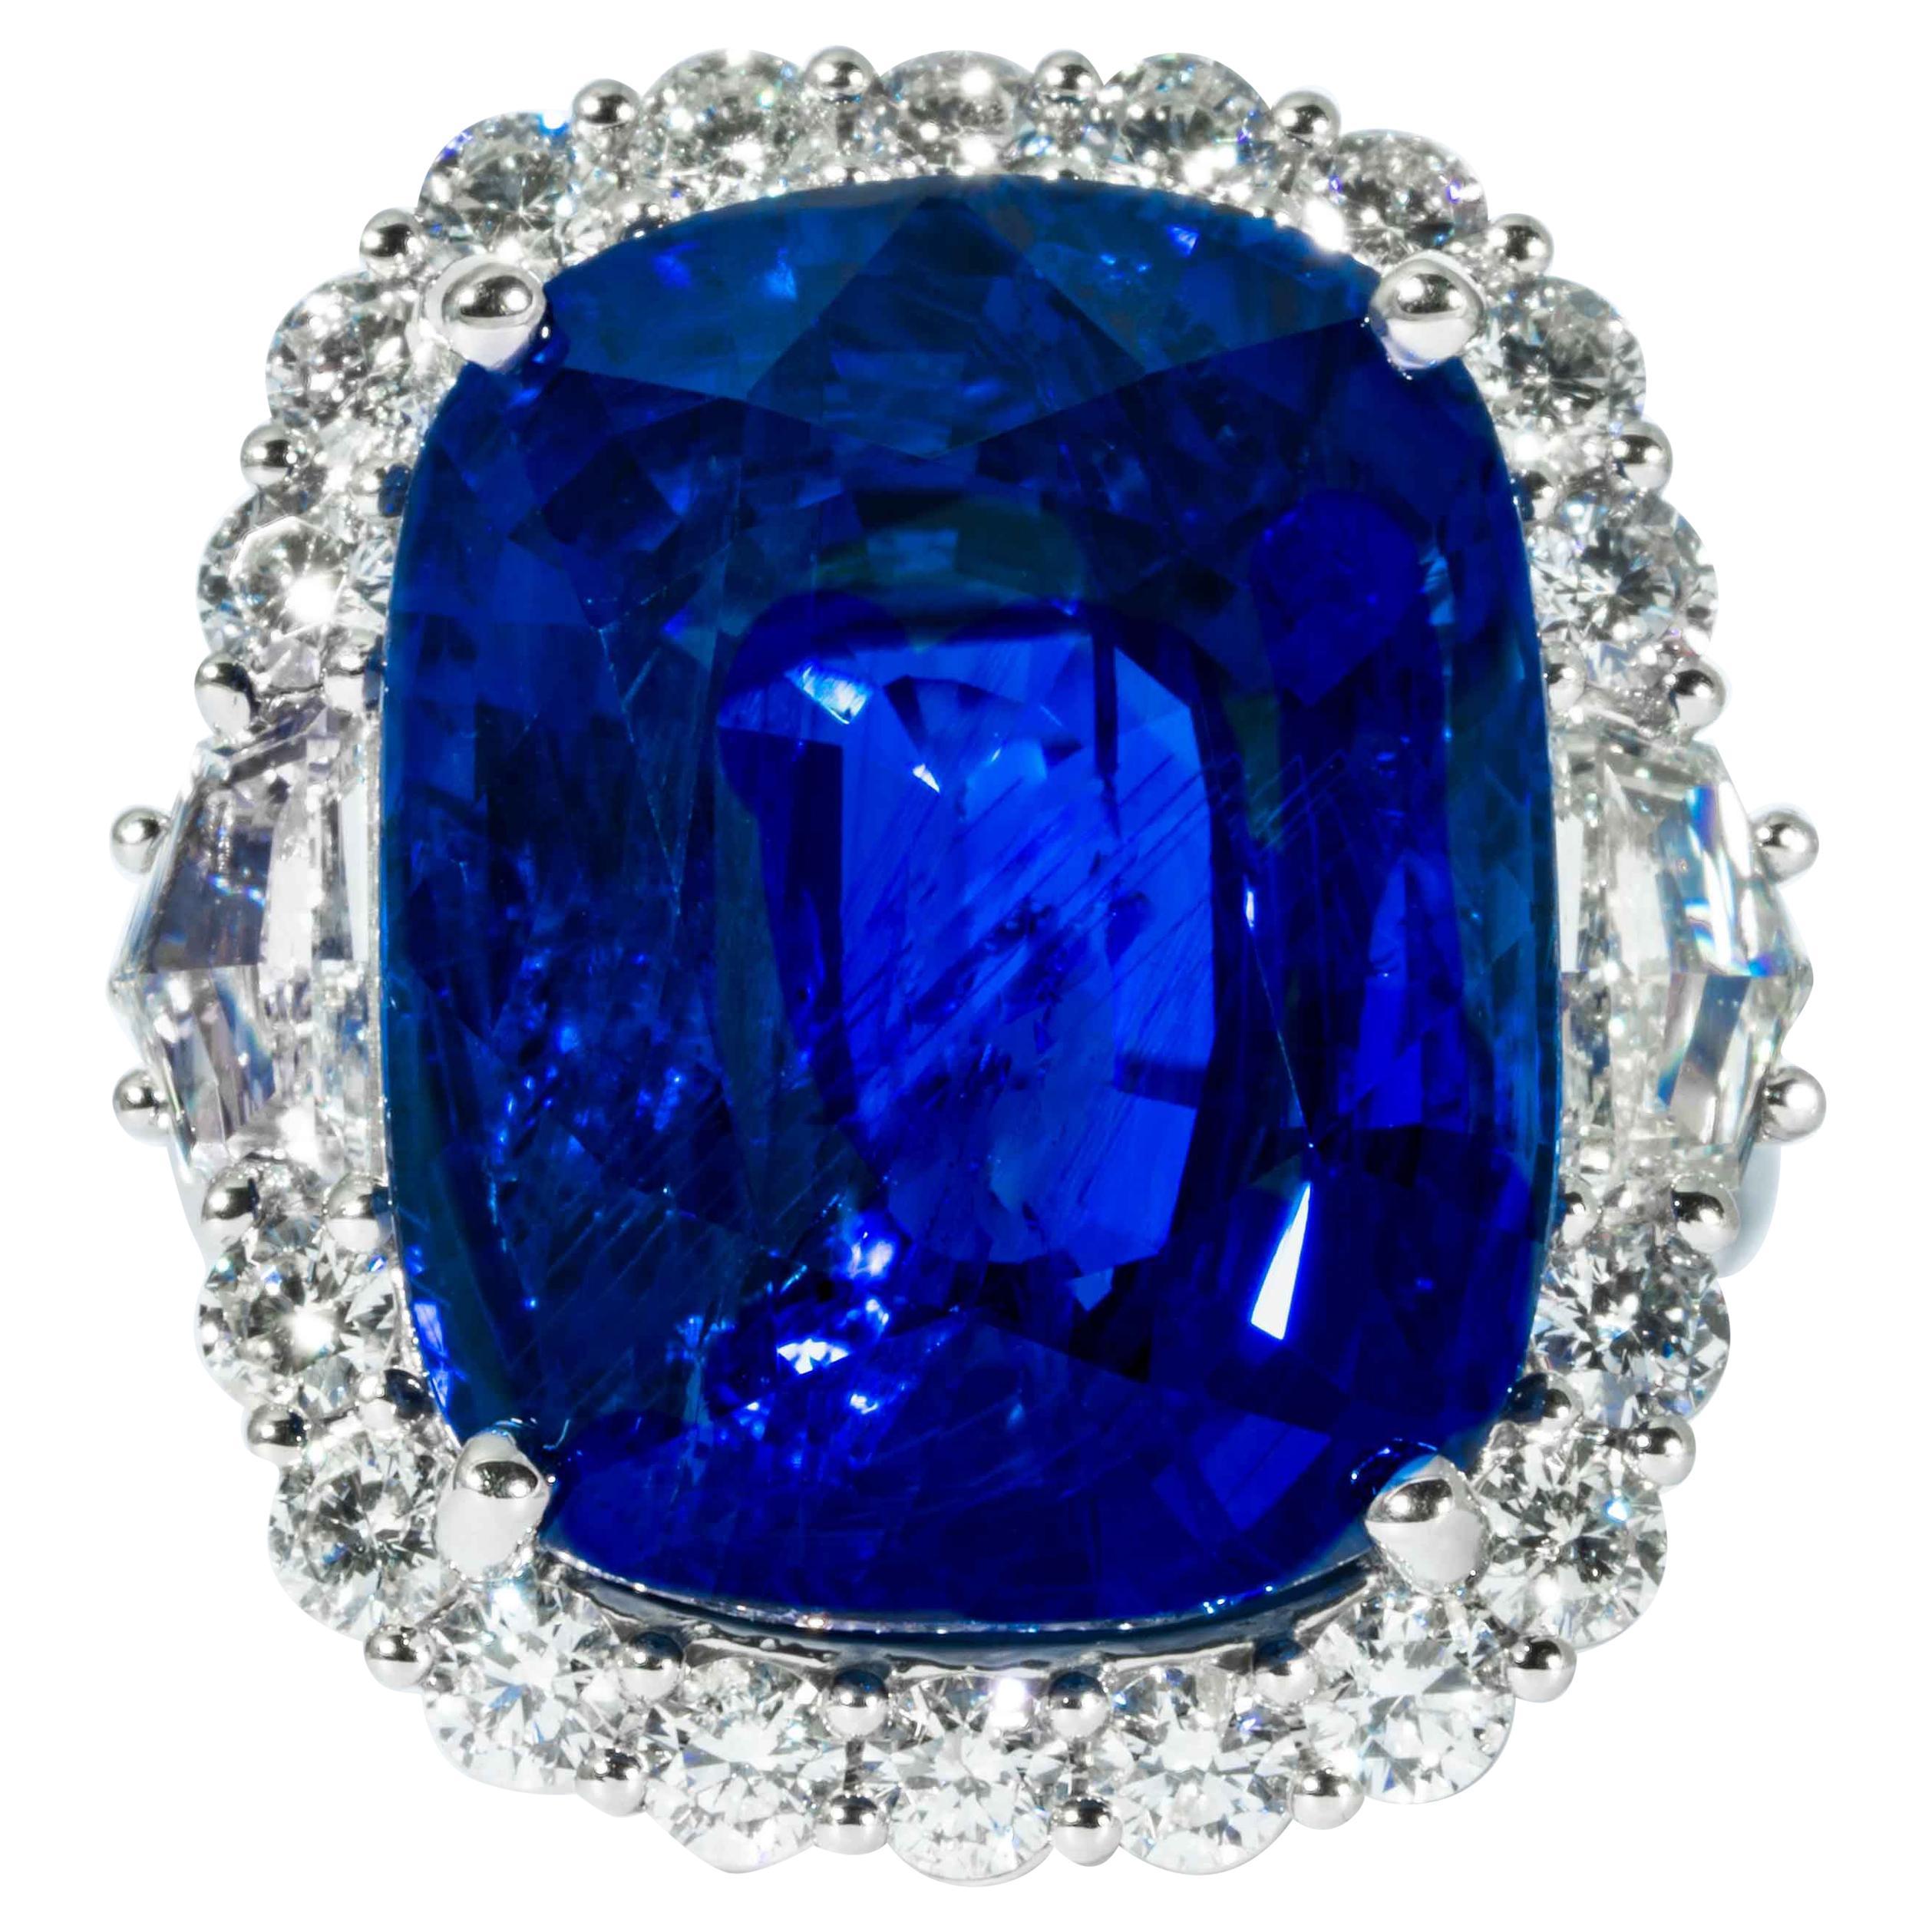 Shreve, Crump & Low 25.43 Carat Blue Sapphire Sapphire and Diamond Platinum Ring